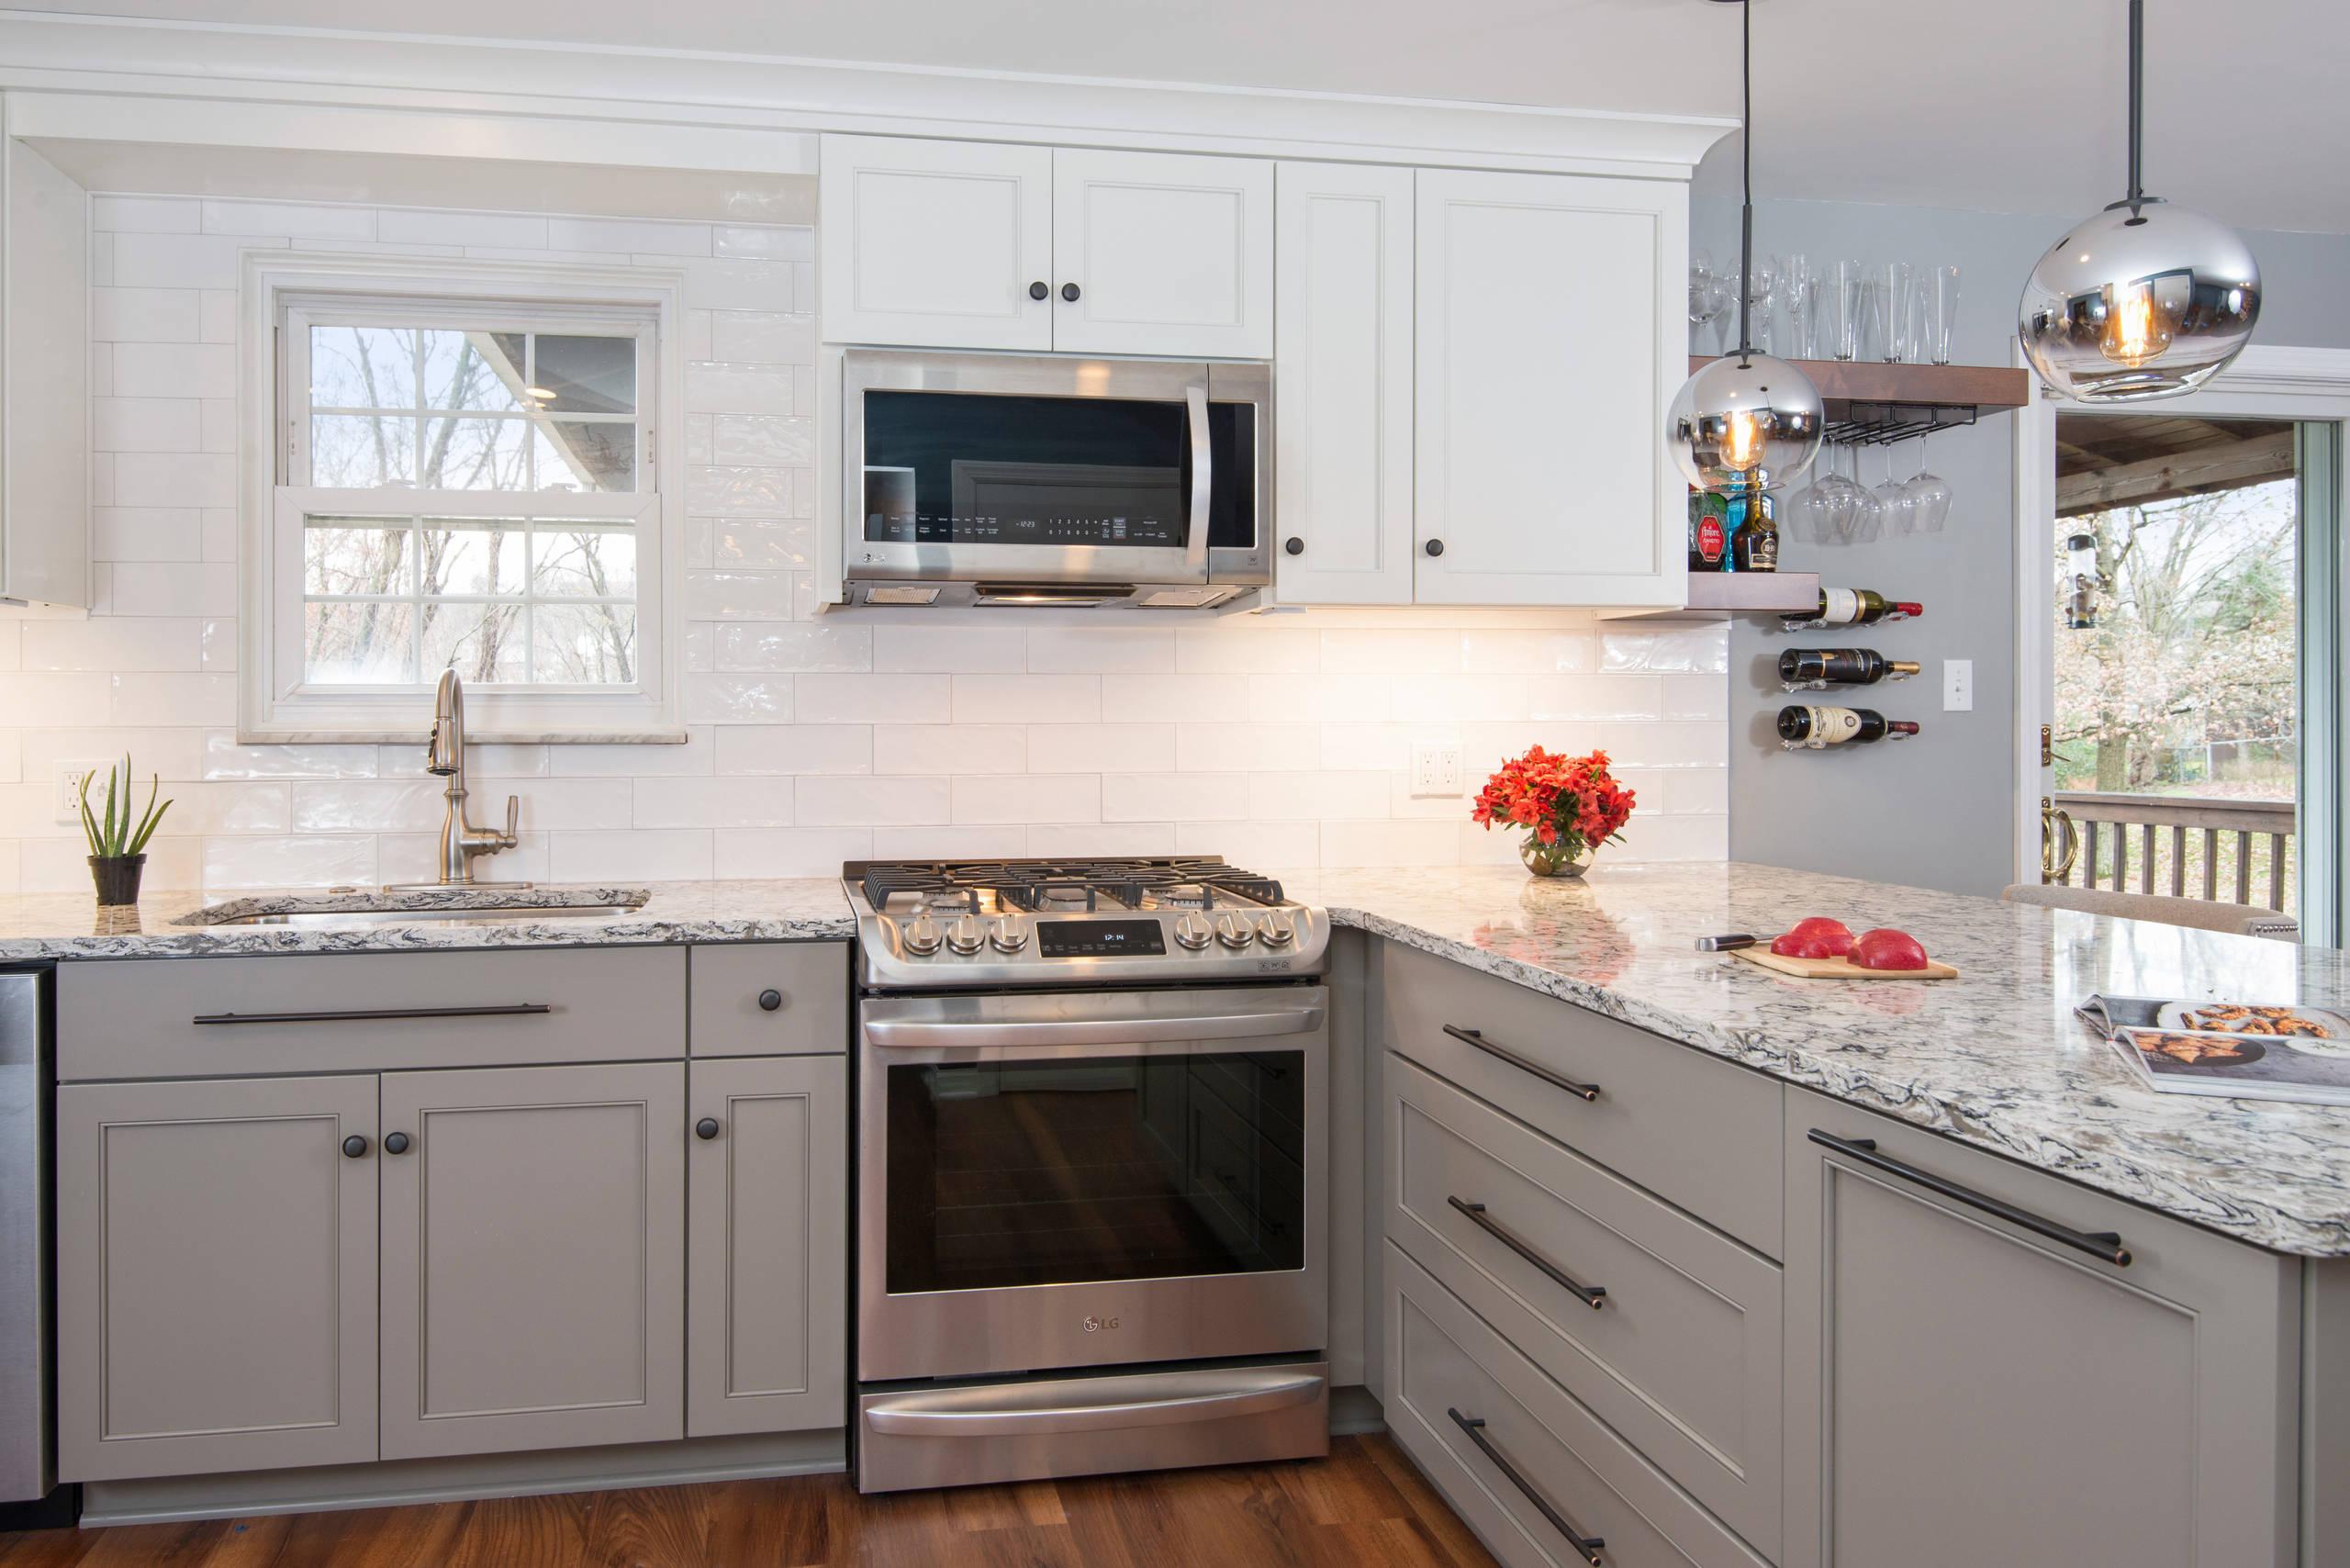 Transitional-Chic Kitchen